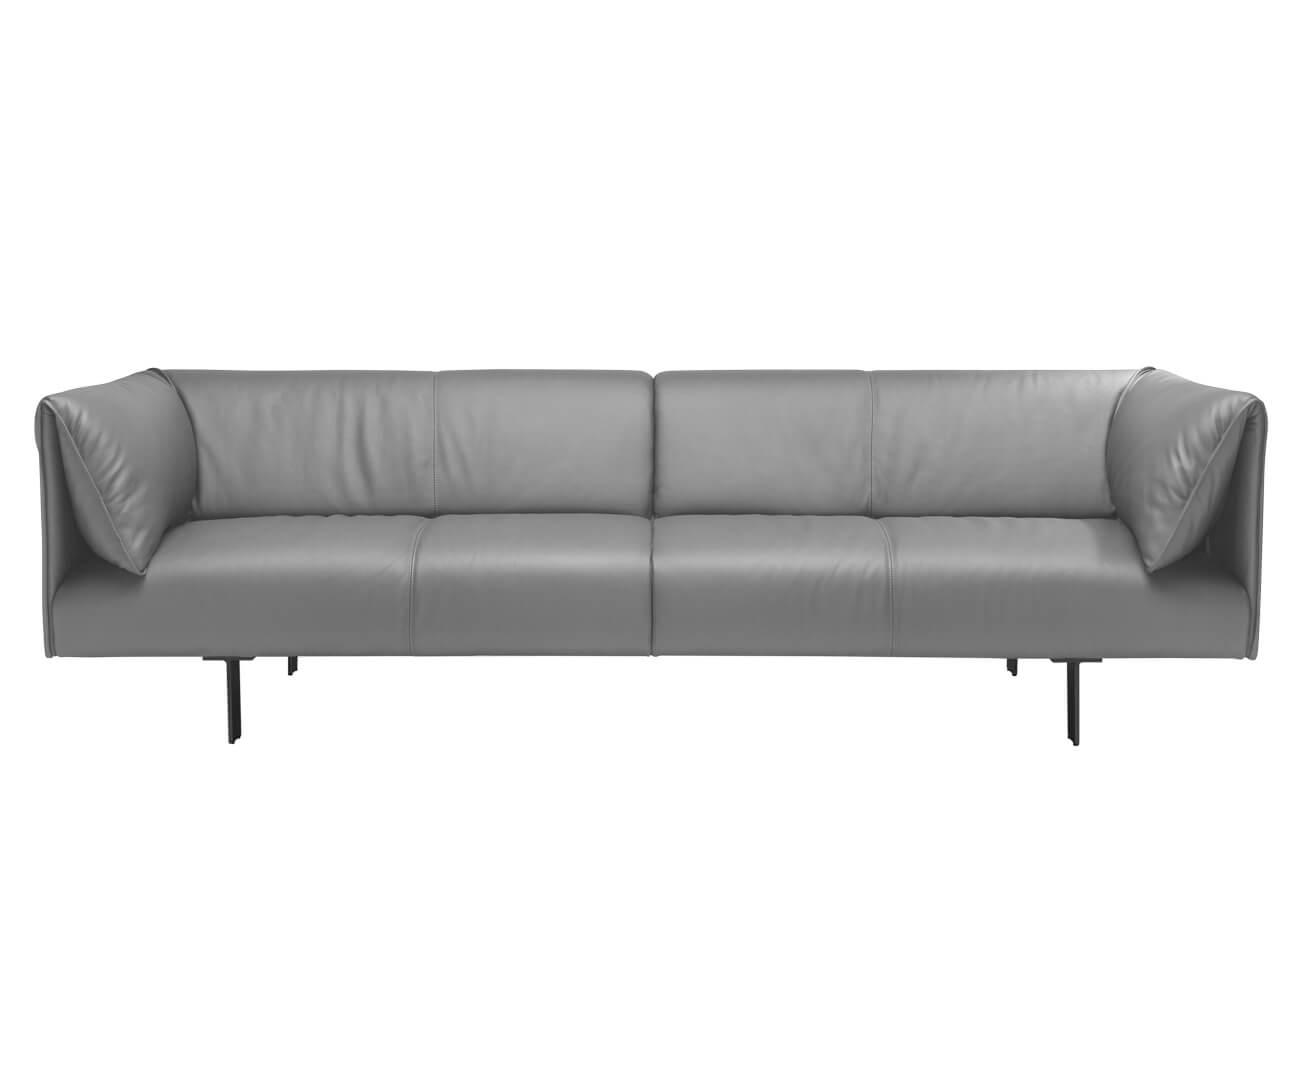 sofá em couro natural taormina 1268